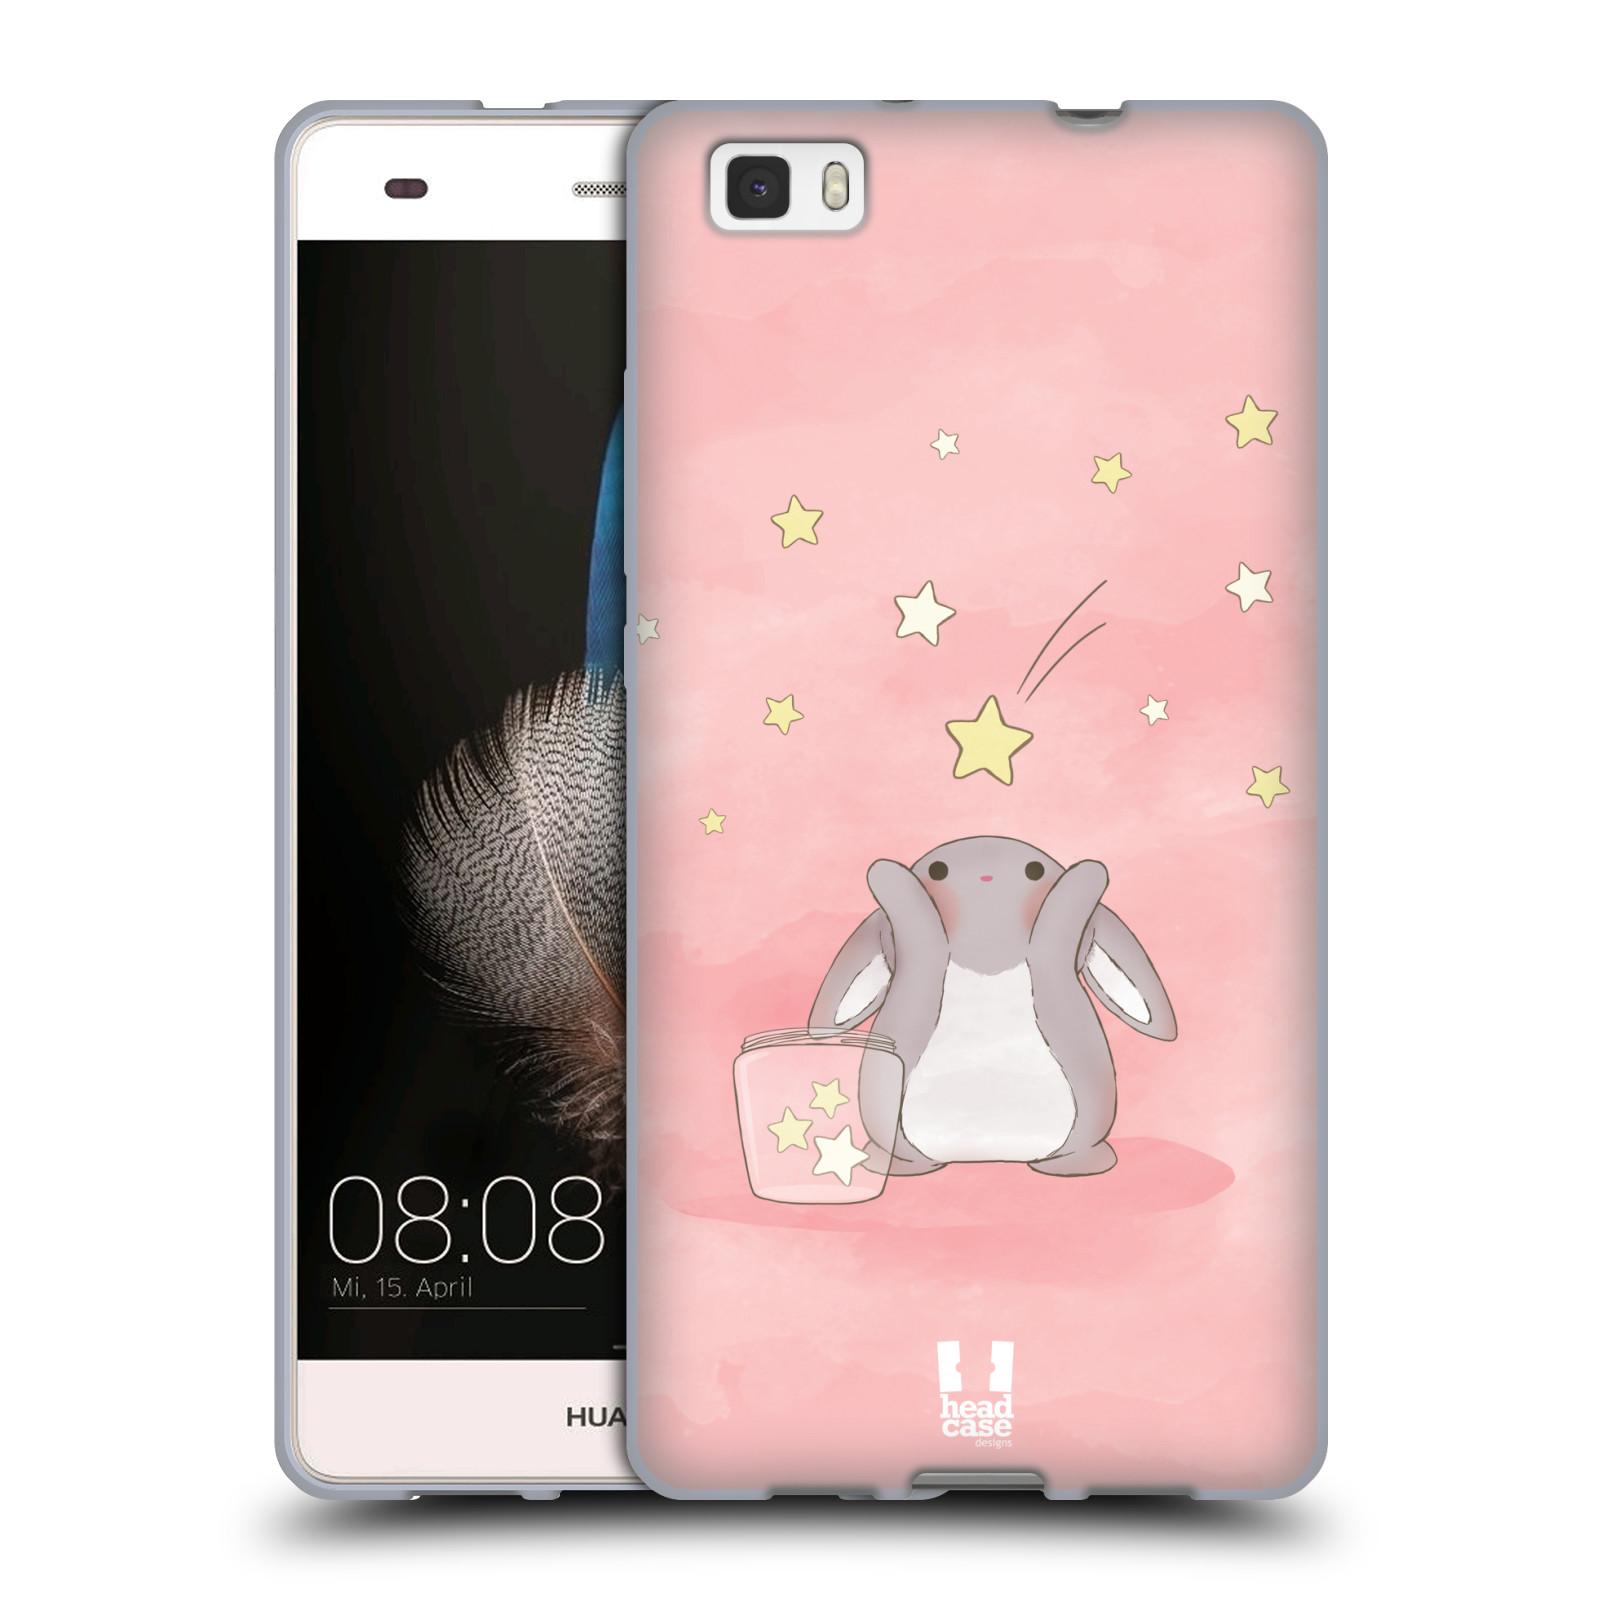 HEAD CASE silikonový obal na mobil HUAWEI P8 LITE vzor králíček a hvězdy růžová